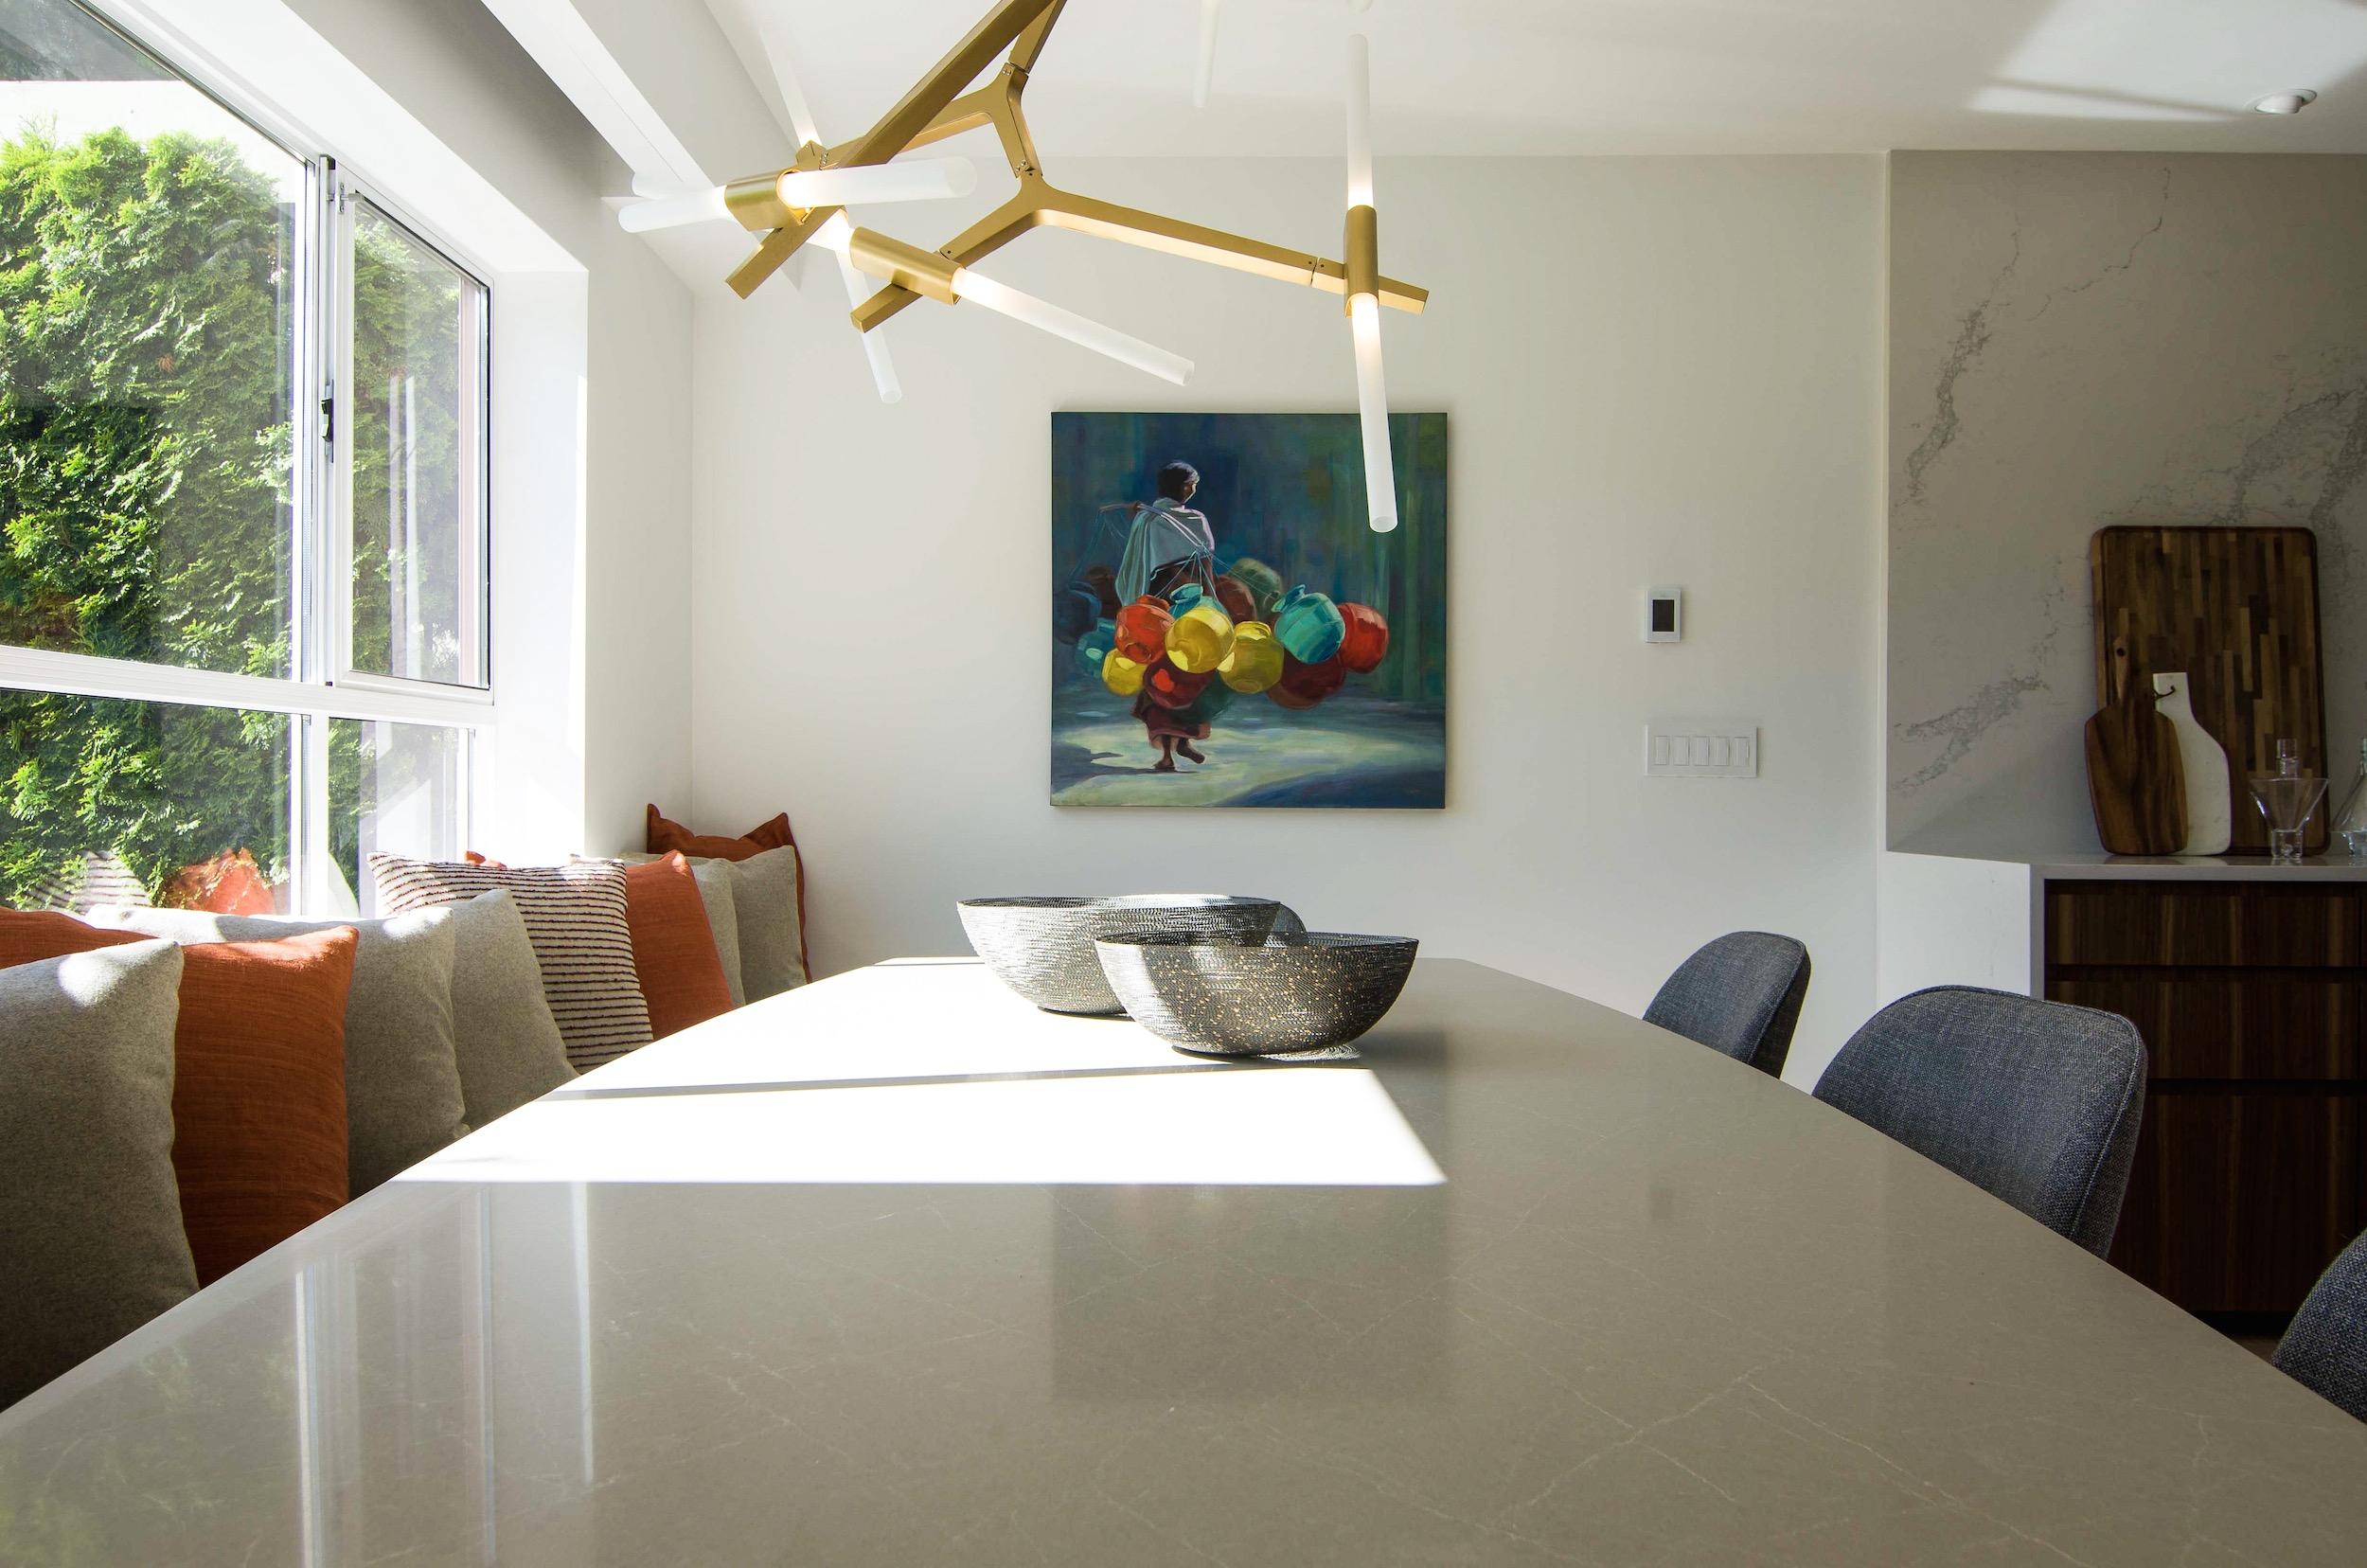 KRC_Spyglass_Dining_Room_Art.JPG